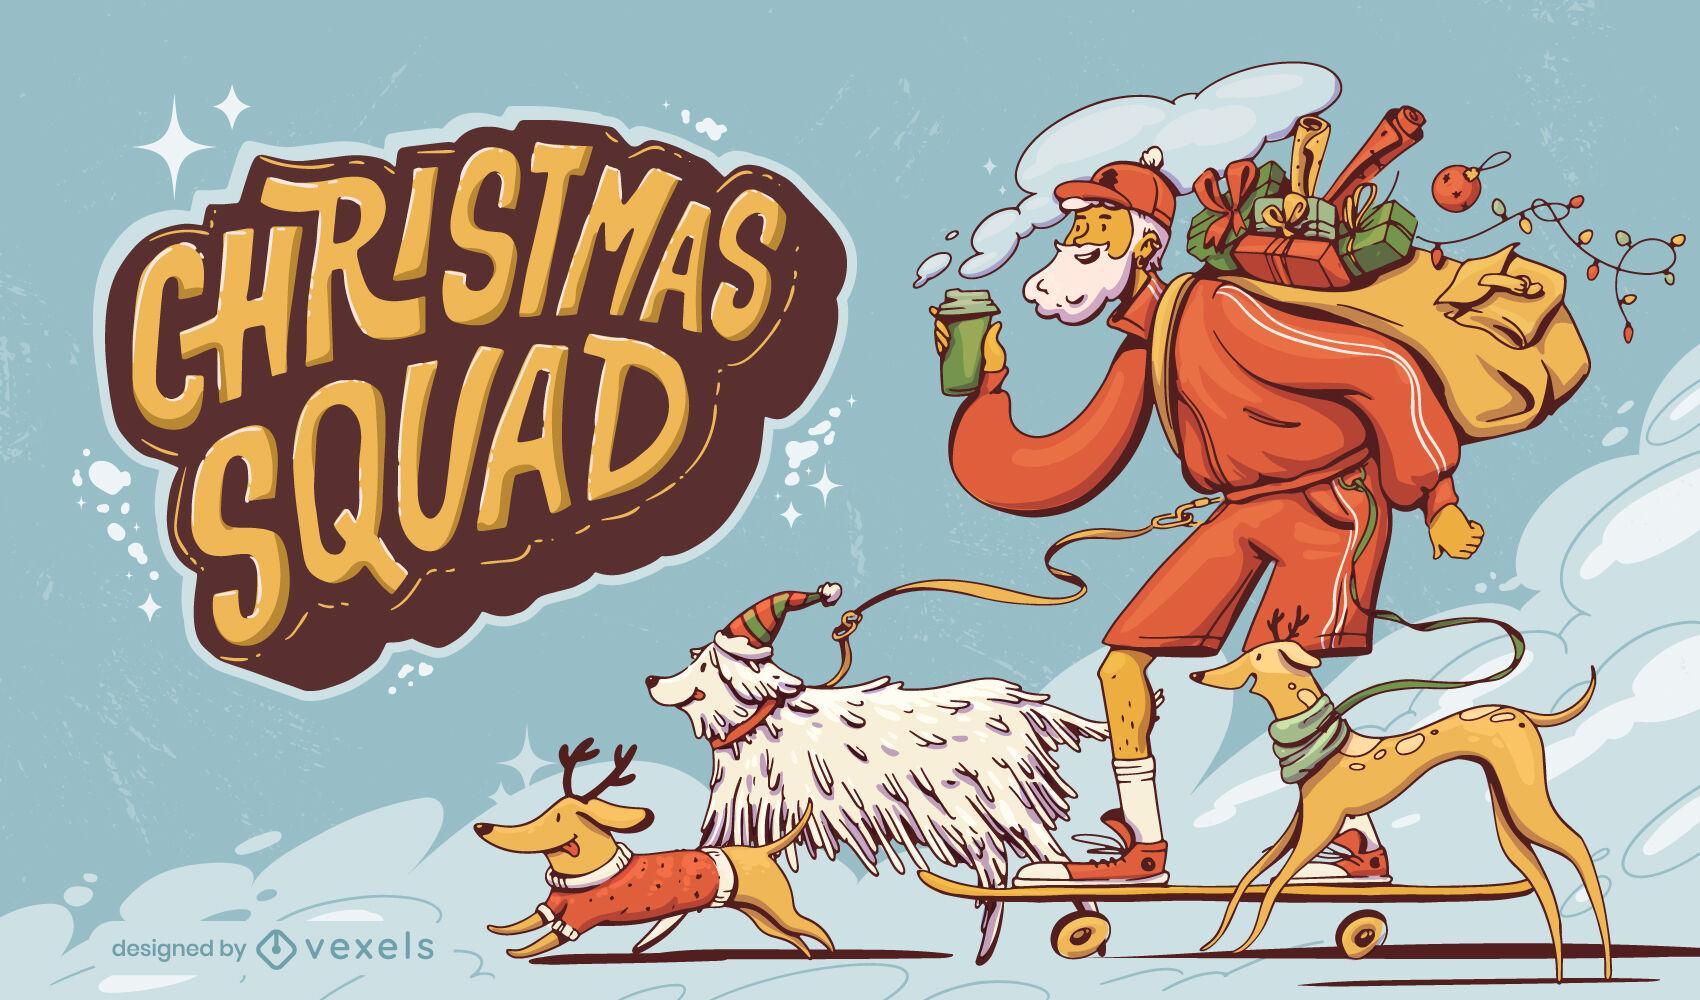 Chrismas santa claus and dogs illustration